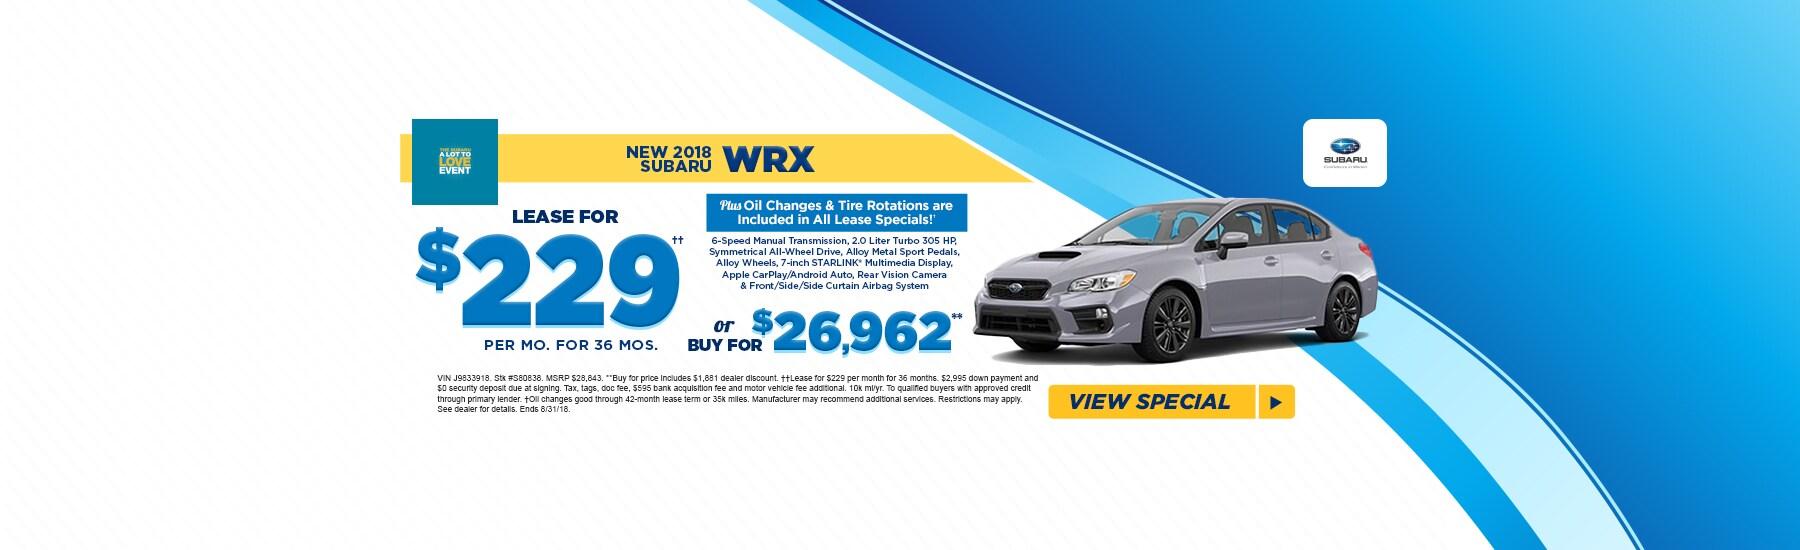 Fred Beans Subaru >> Subaru Wrx Special Doylestown Pa Fred Beans Subaru